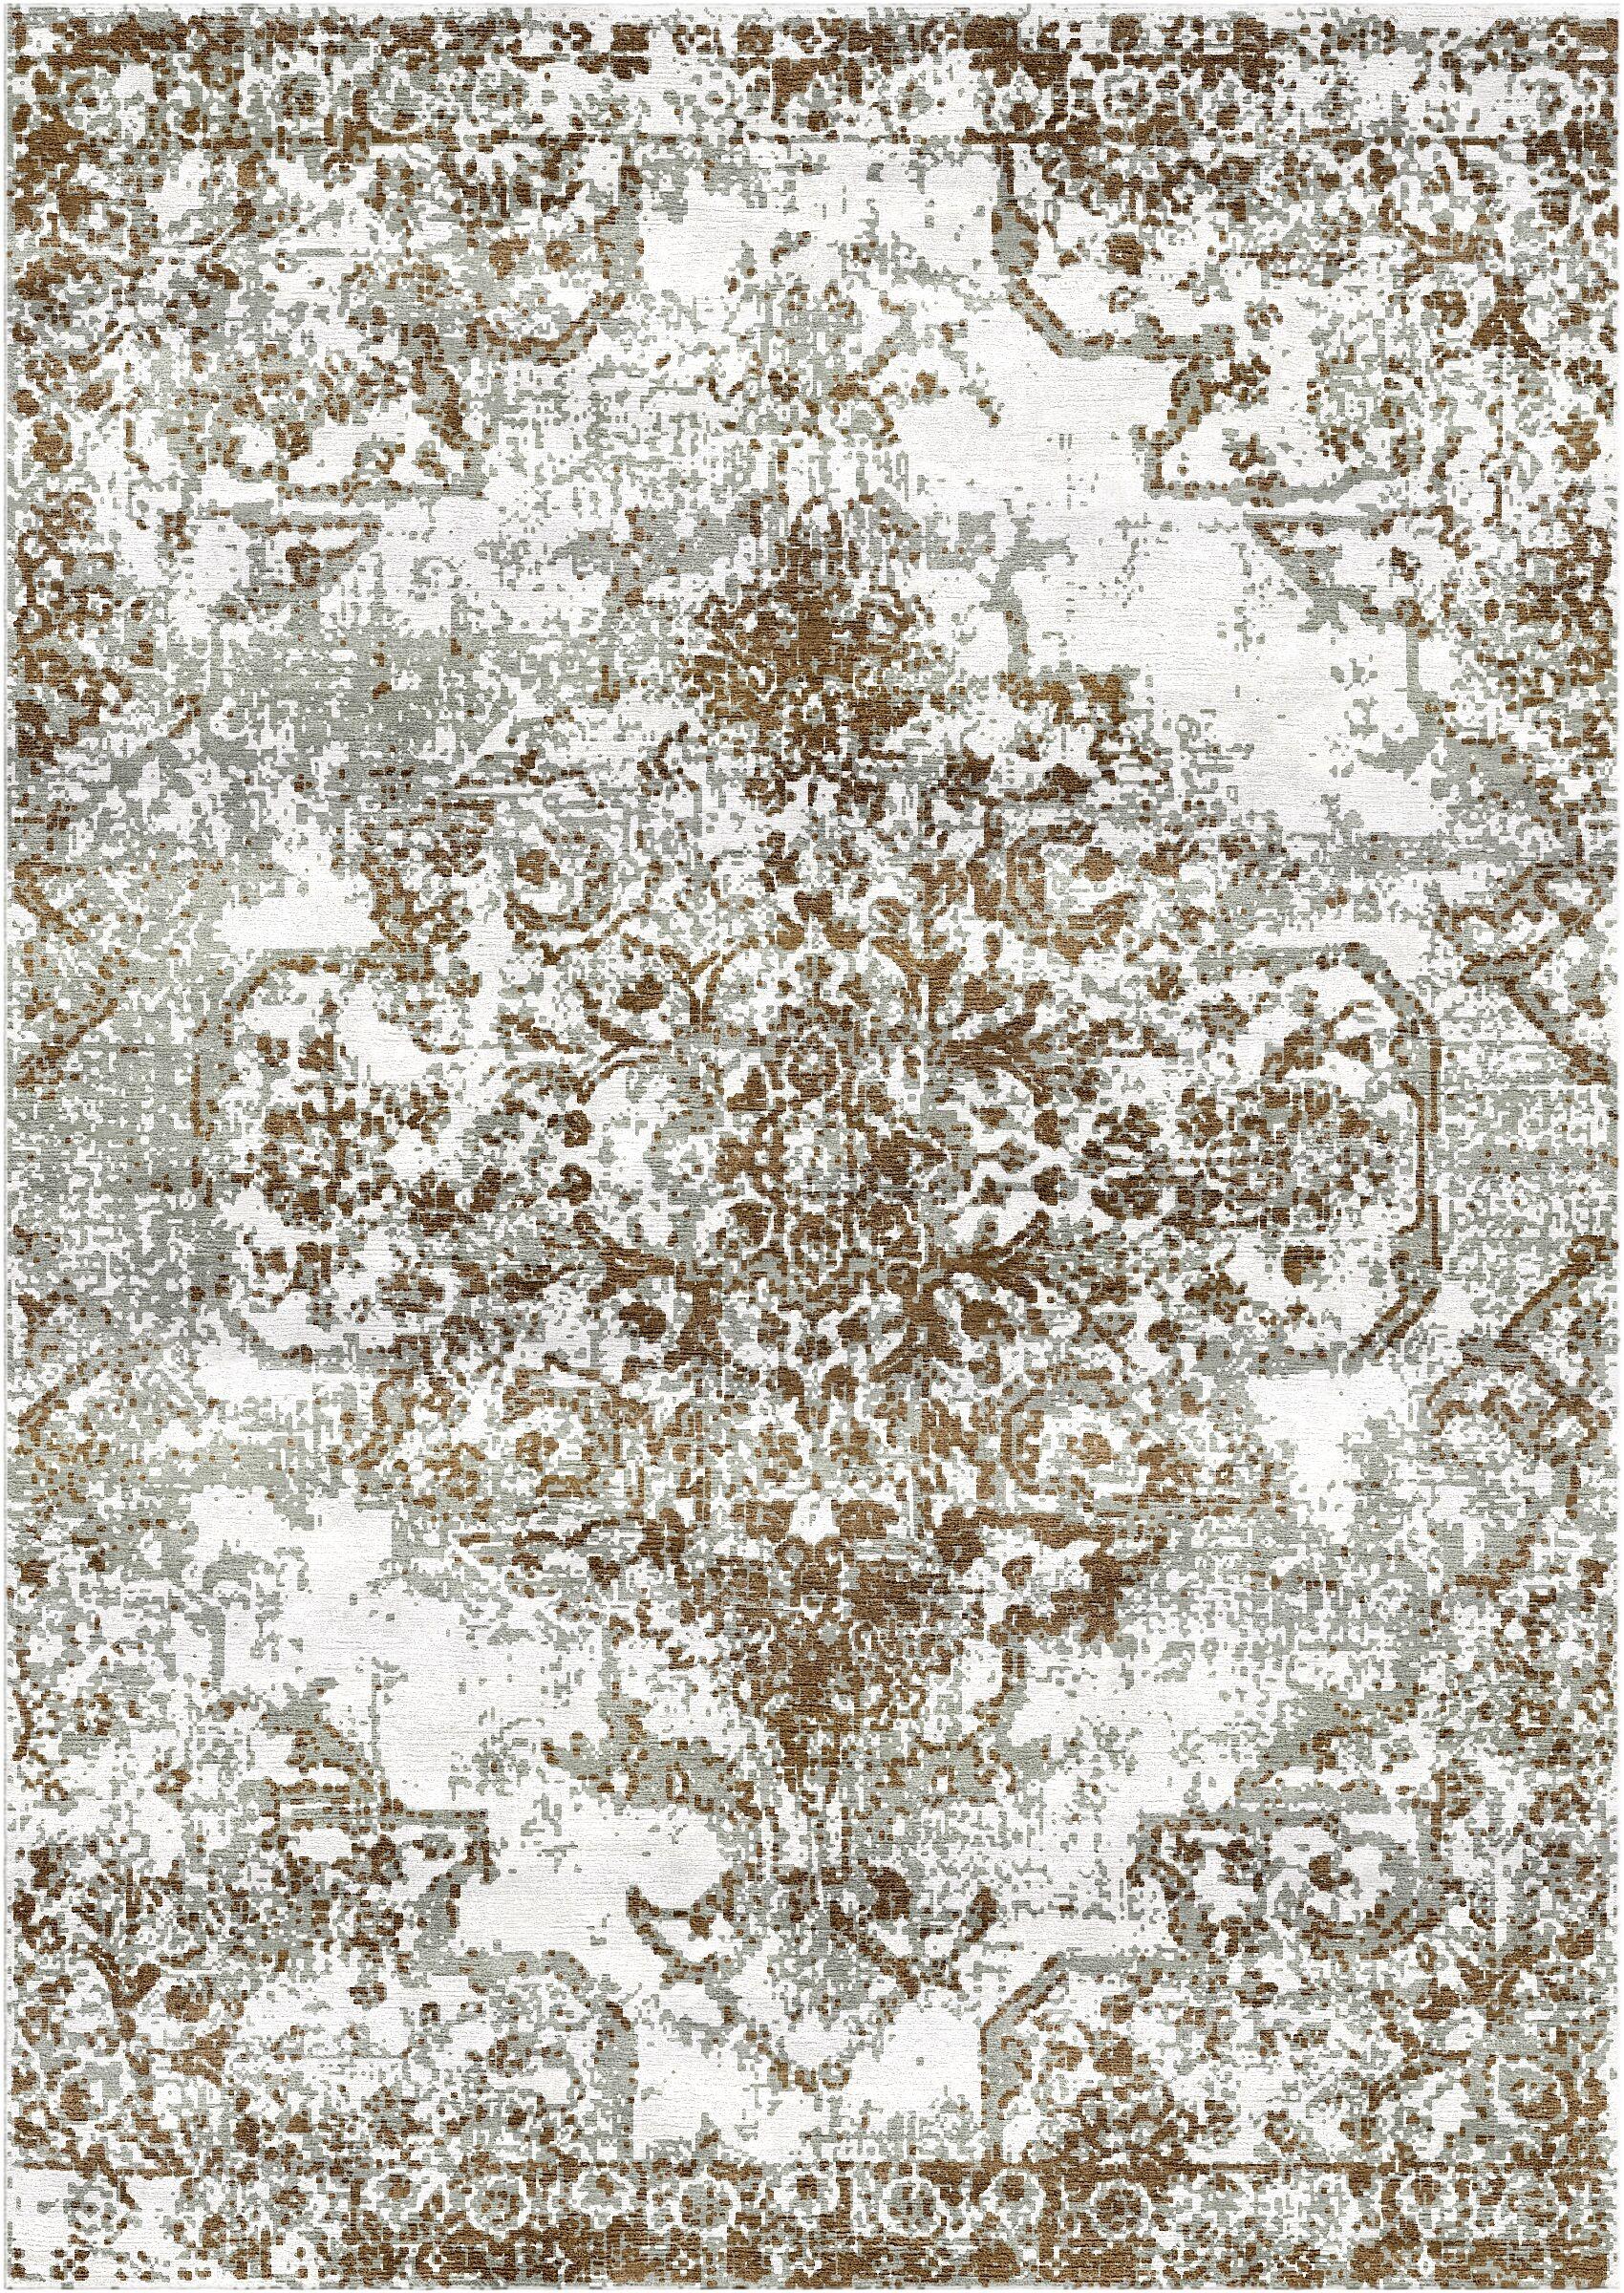 Aliza Handloom Brown/Gray Area Rug Rug Size: Square 9'